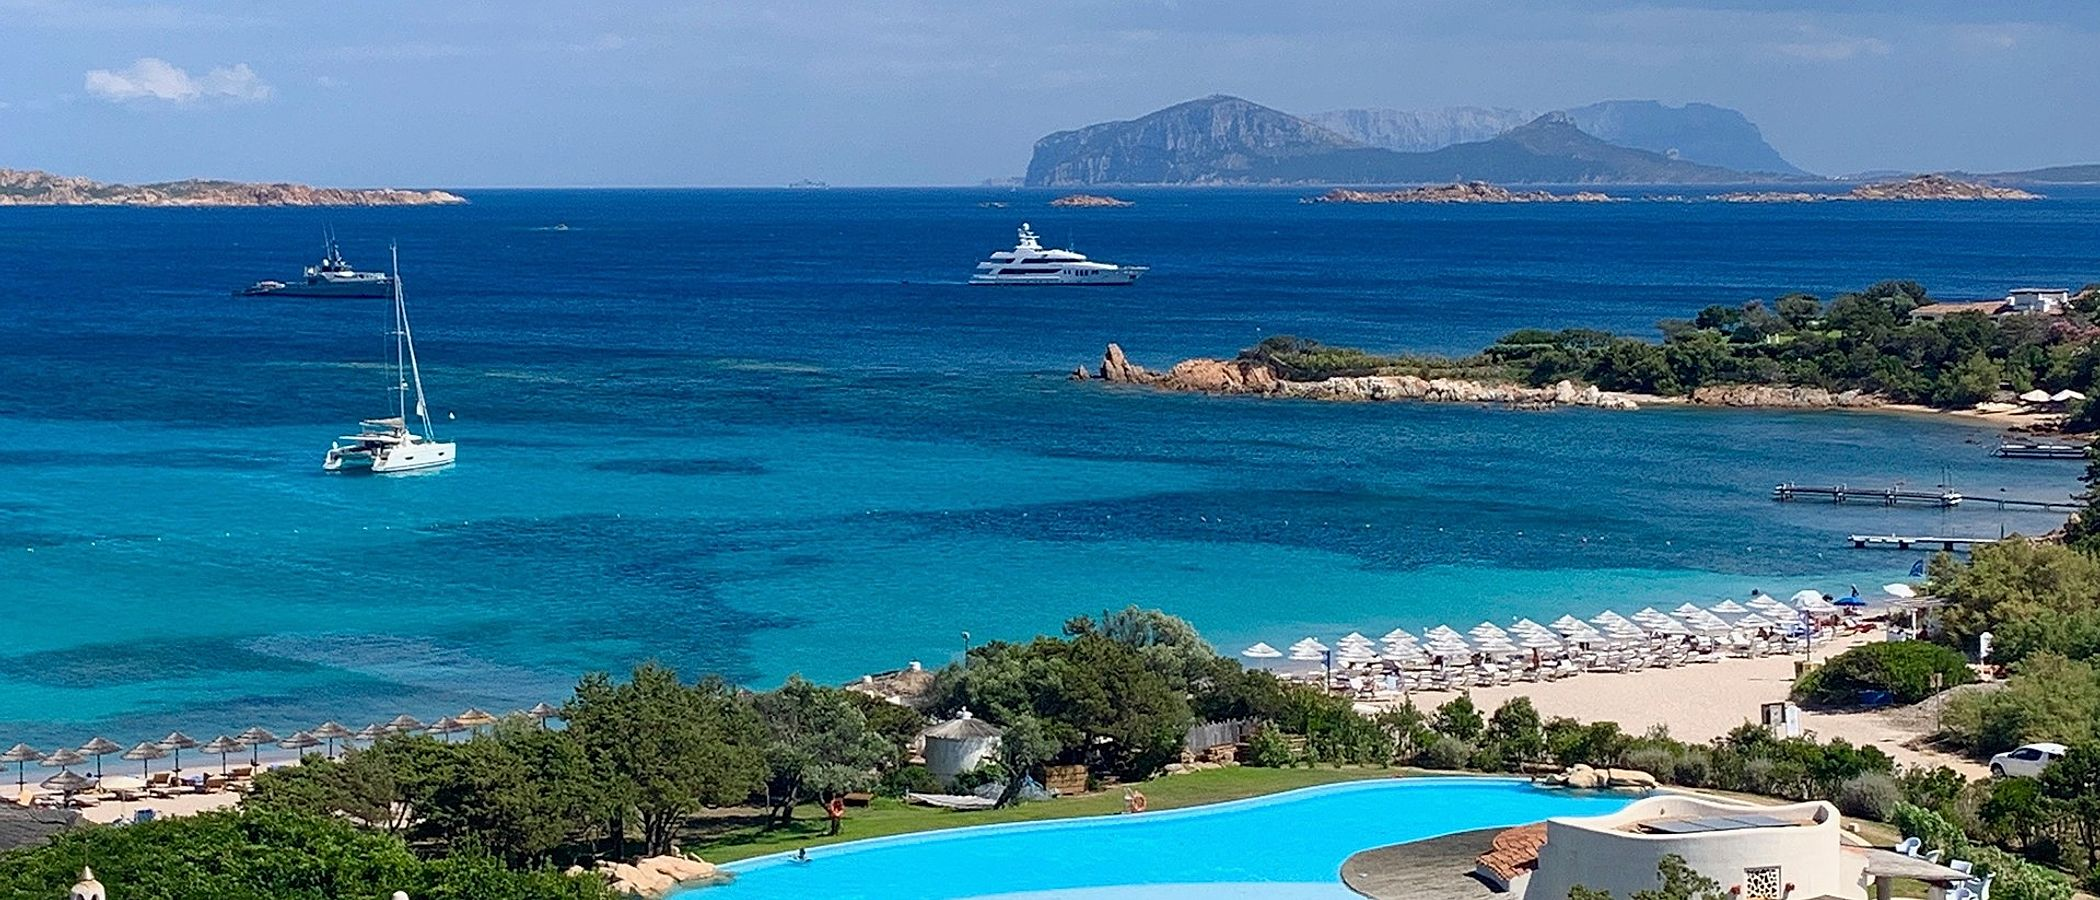 Costa Smeralda travel packages